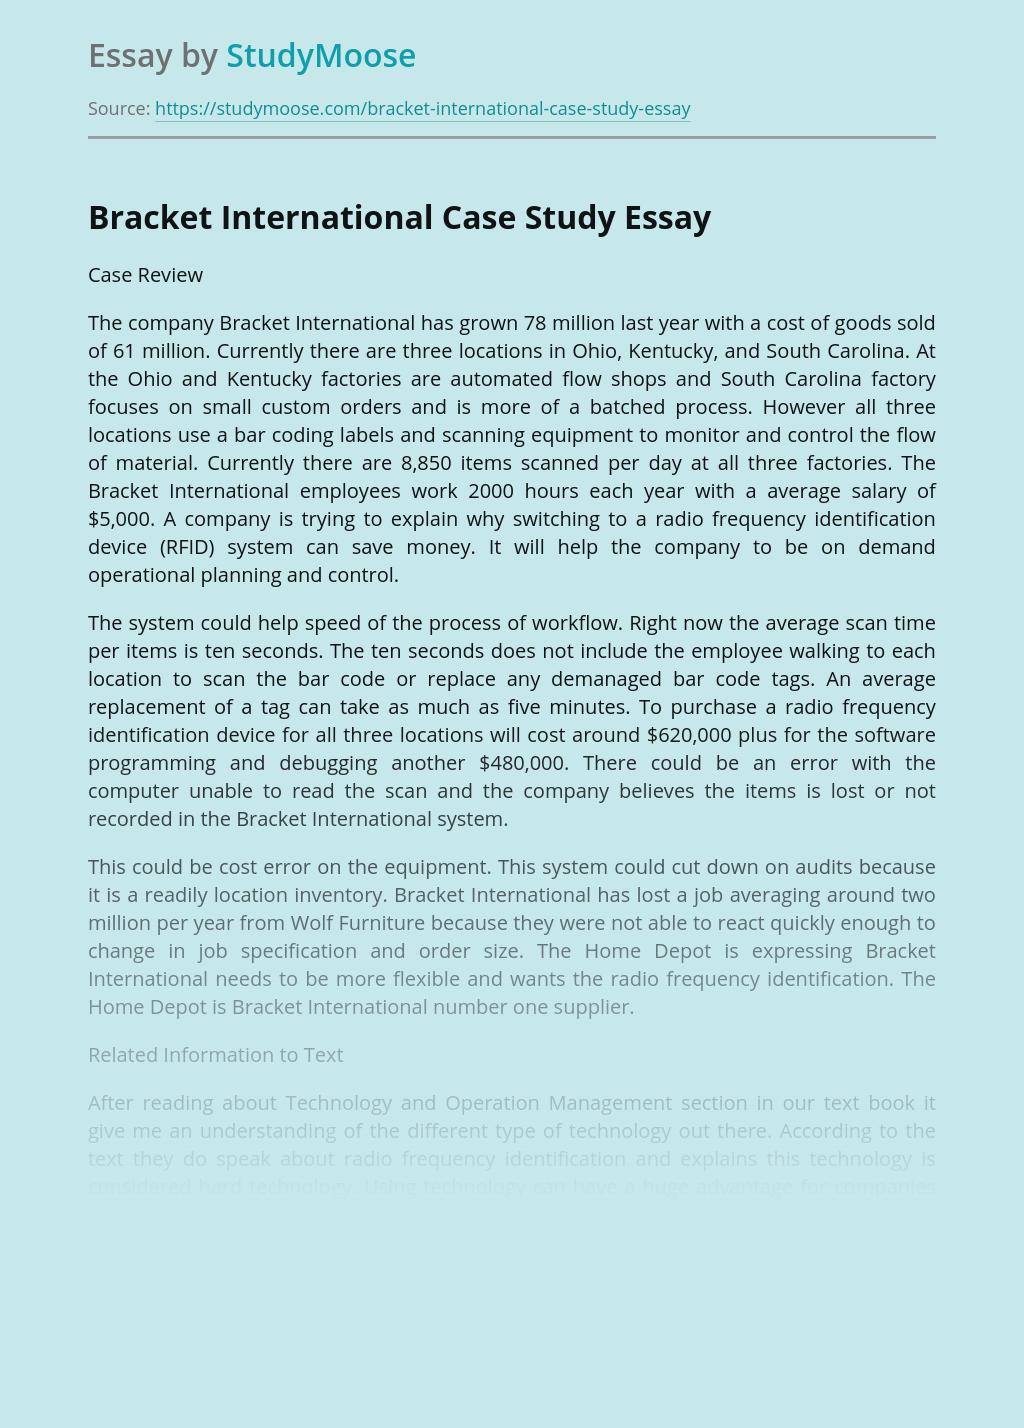 Bracket International Case Study